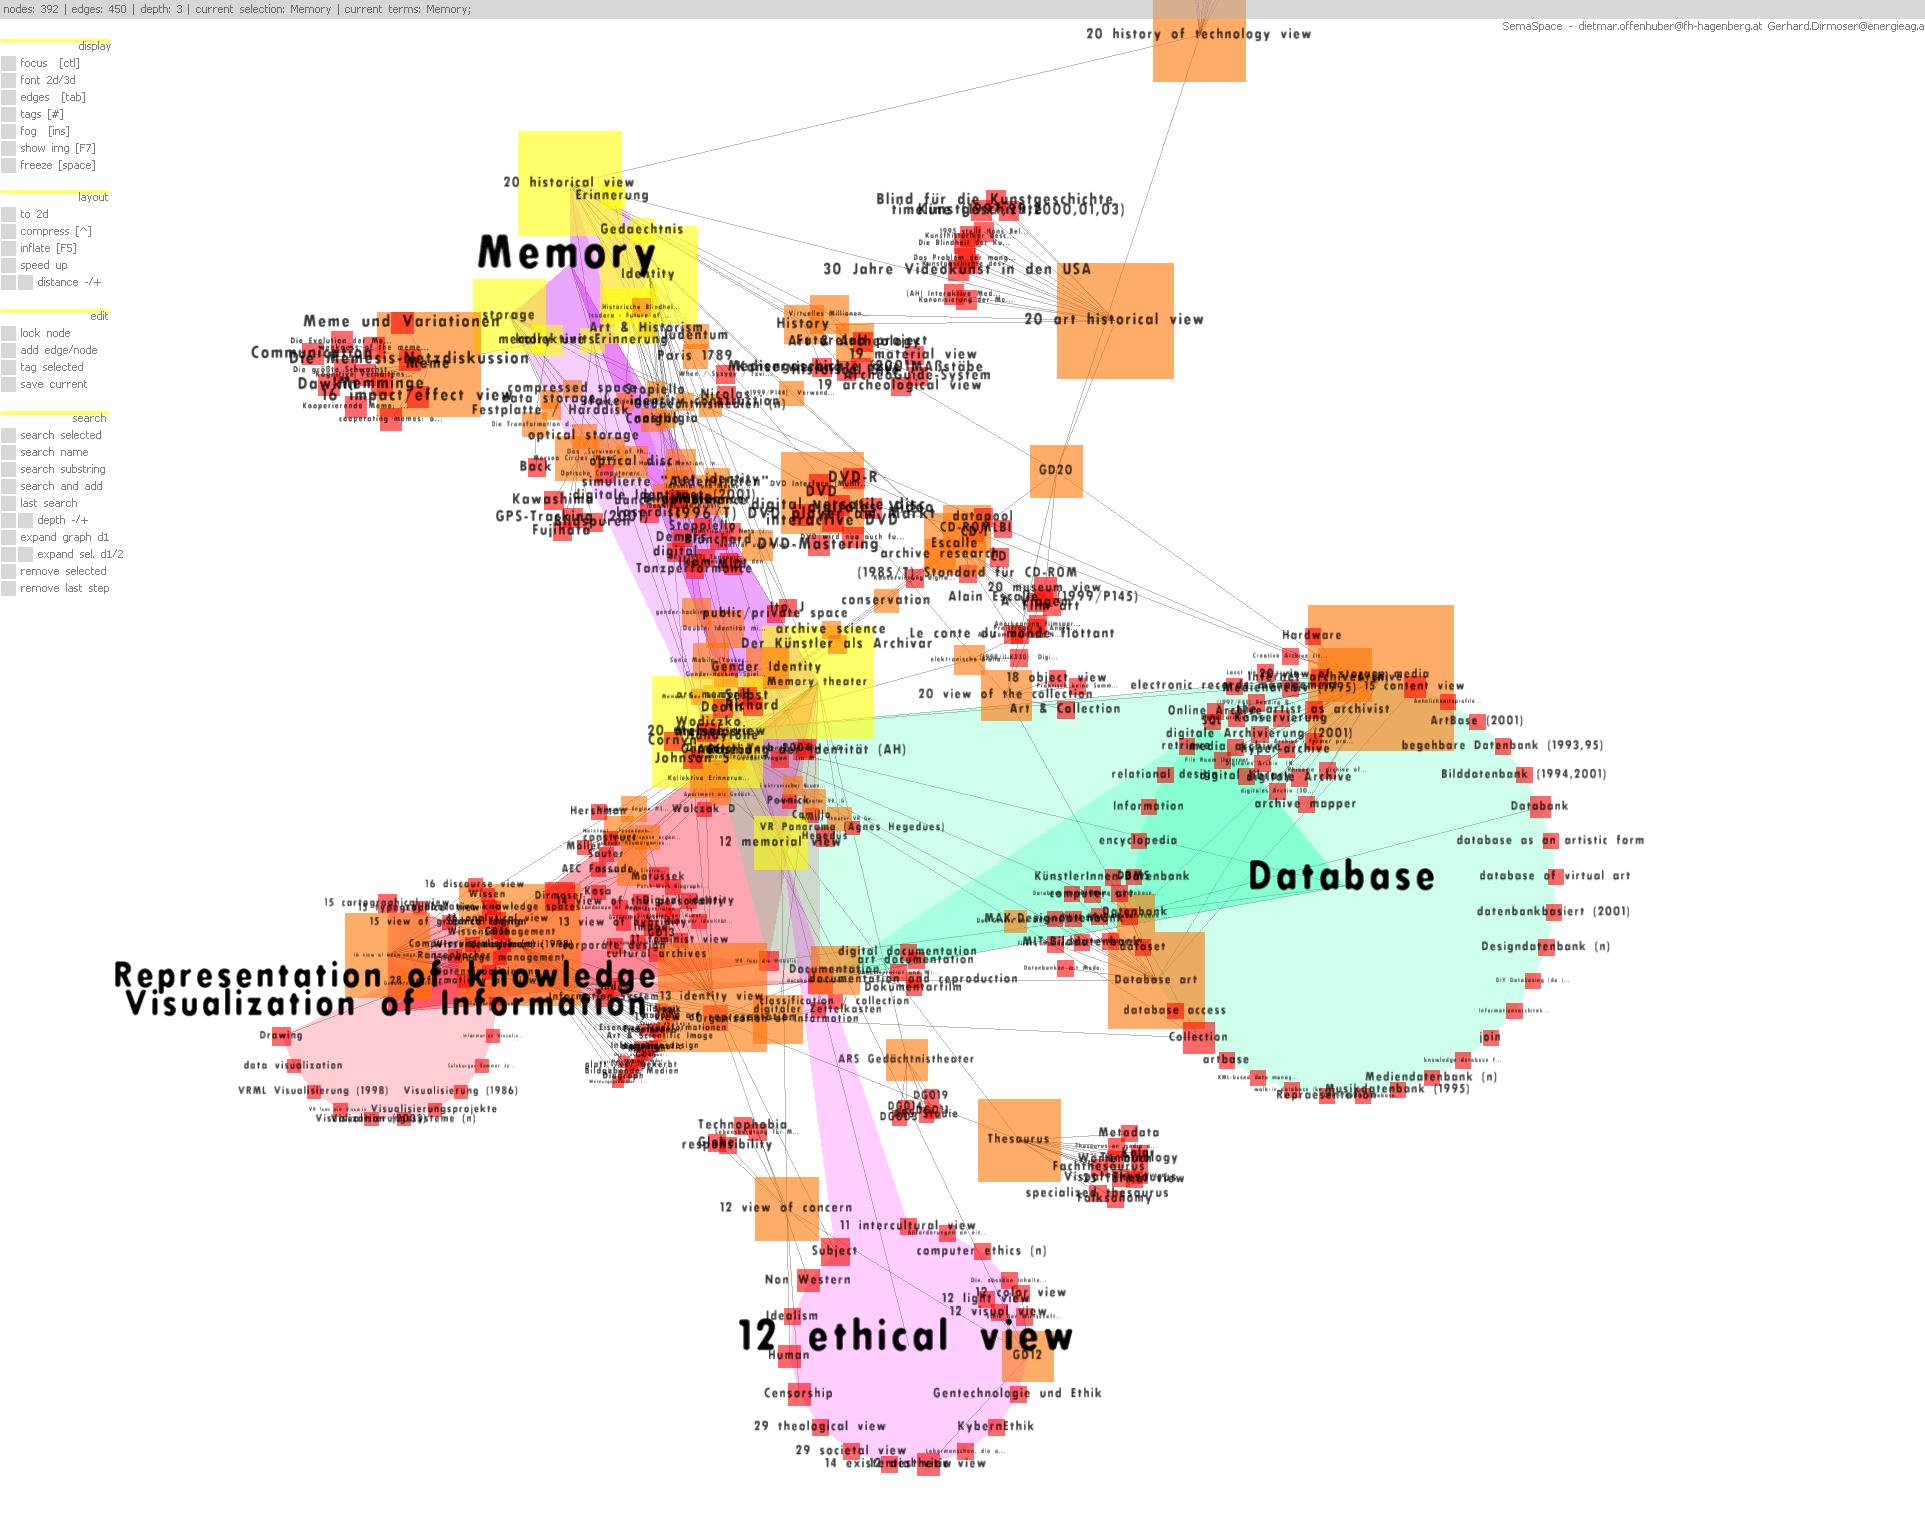 Image from the ars thesaurus (Gerhard Dirmoser)